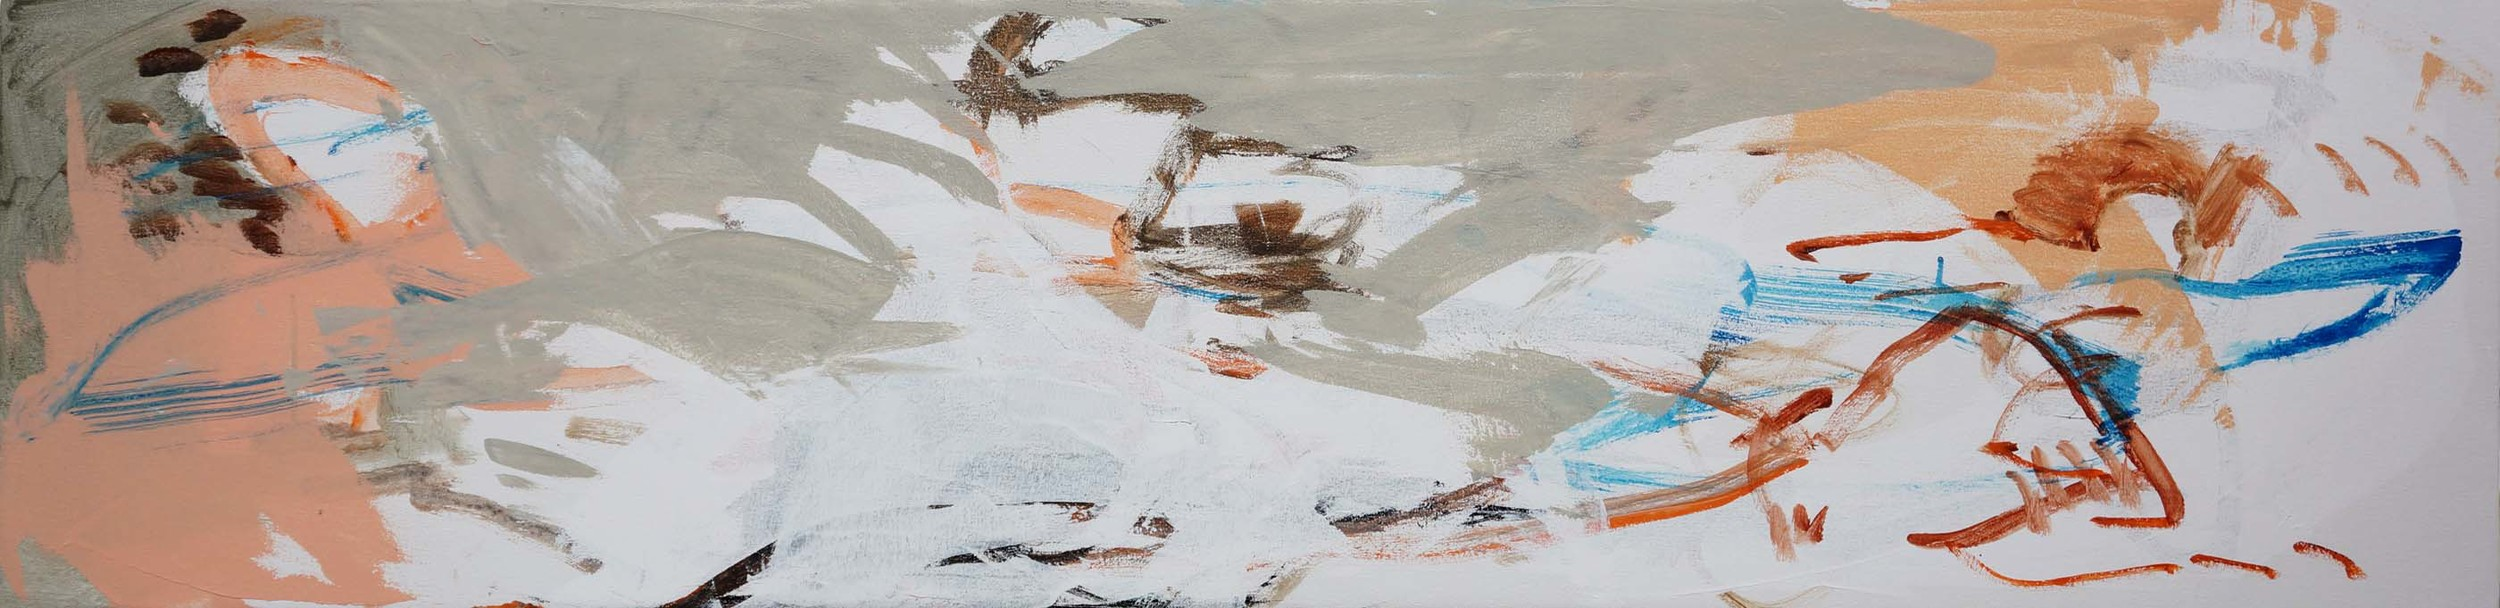 "stage 3:  ni zan creek  16x66""  acrylic on canvas"